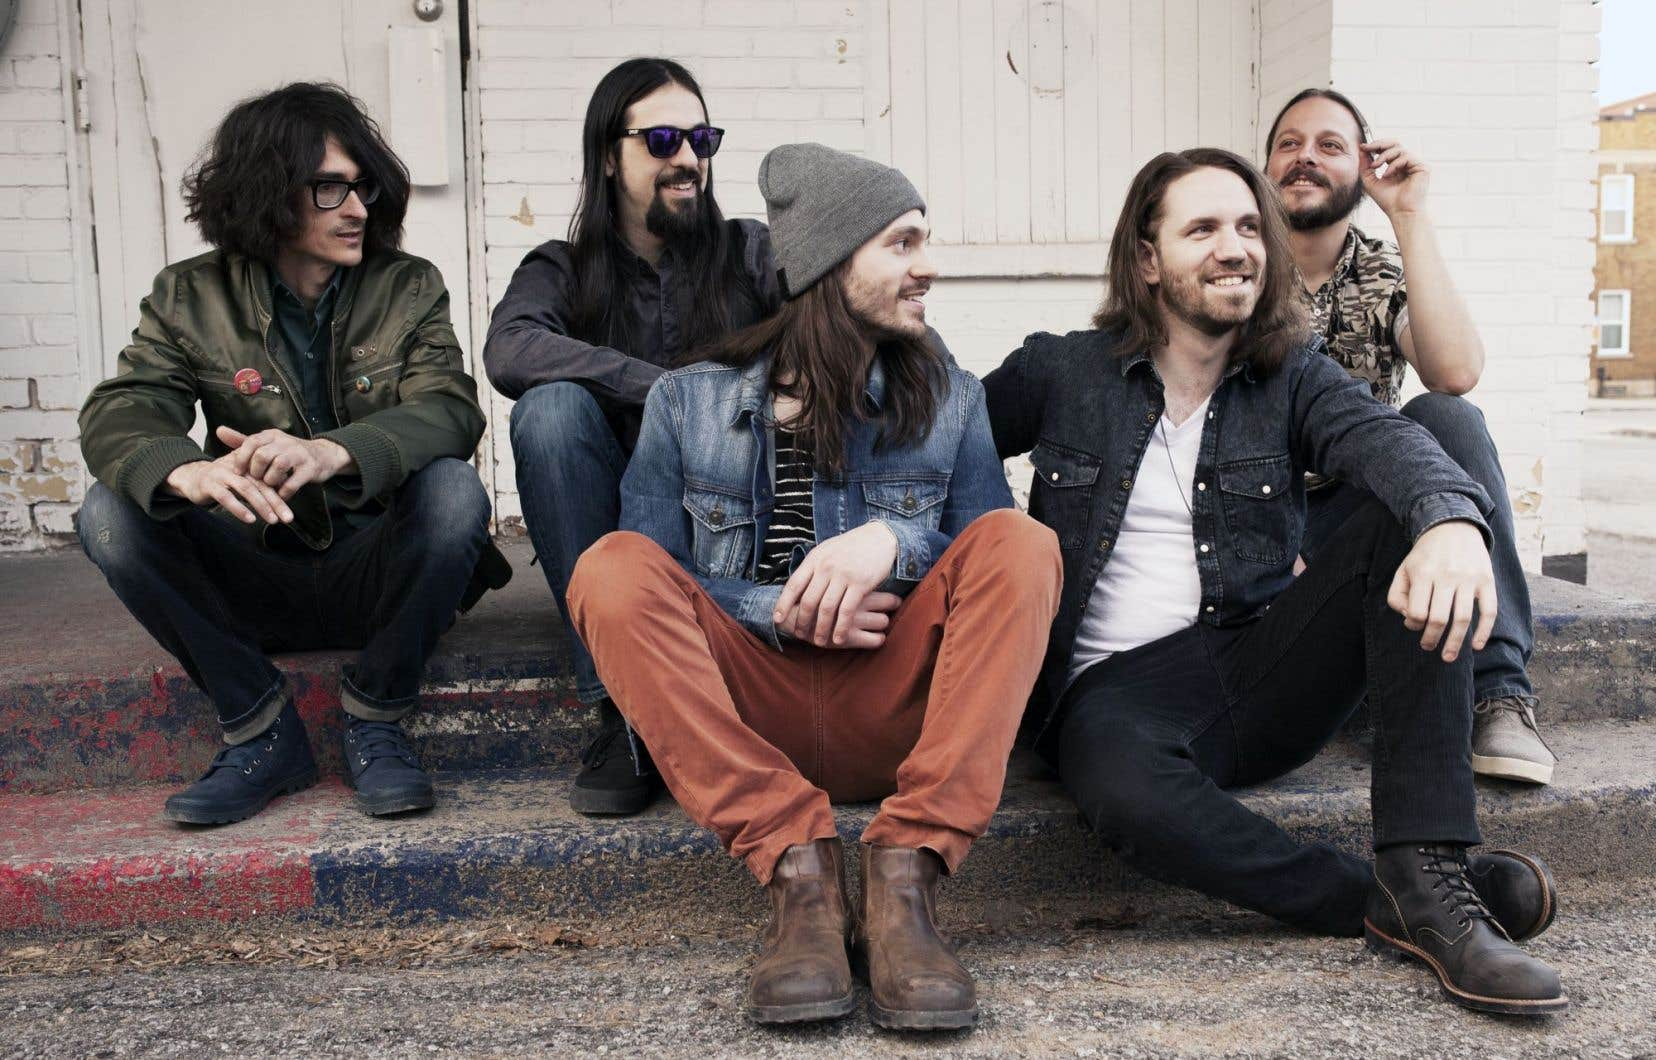 Raton Lover, groupe de rock franco de Québec